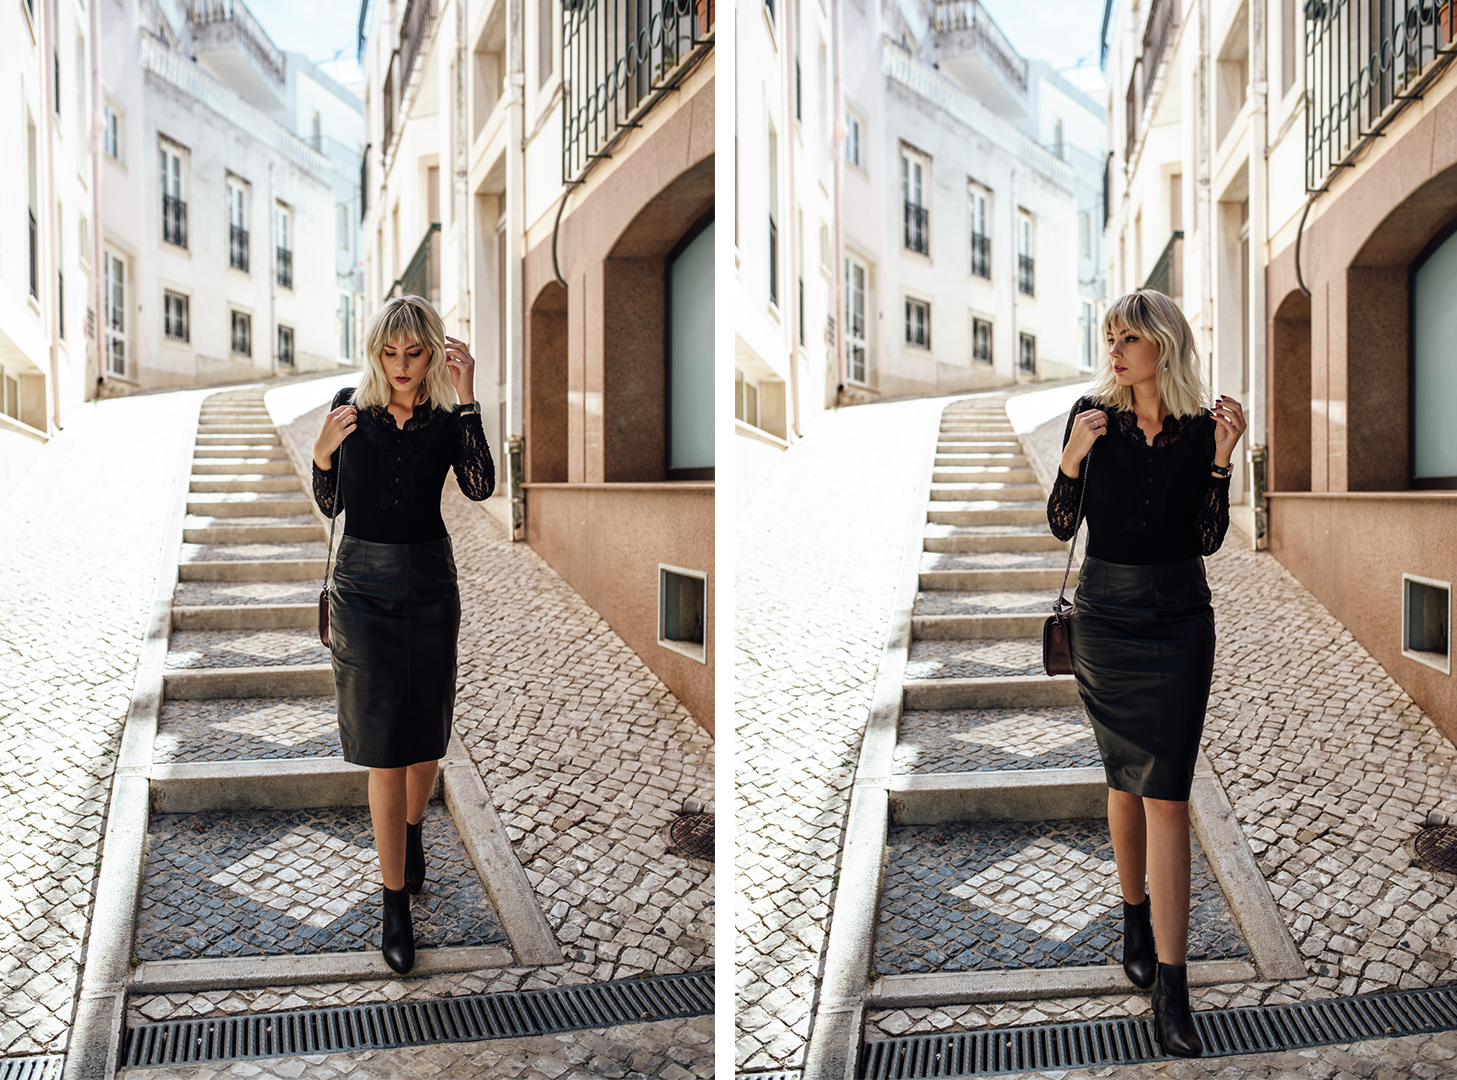 Lederrock im Herbst kombinieren_Lederrock kombinieren_Styling Tipps_Modeblog_Fashionblog_Kiamisu_Final1